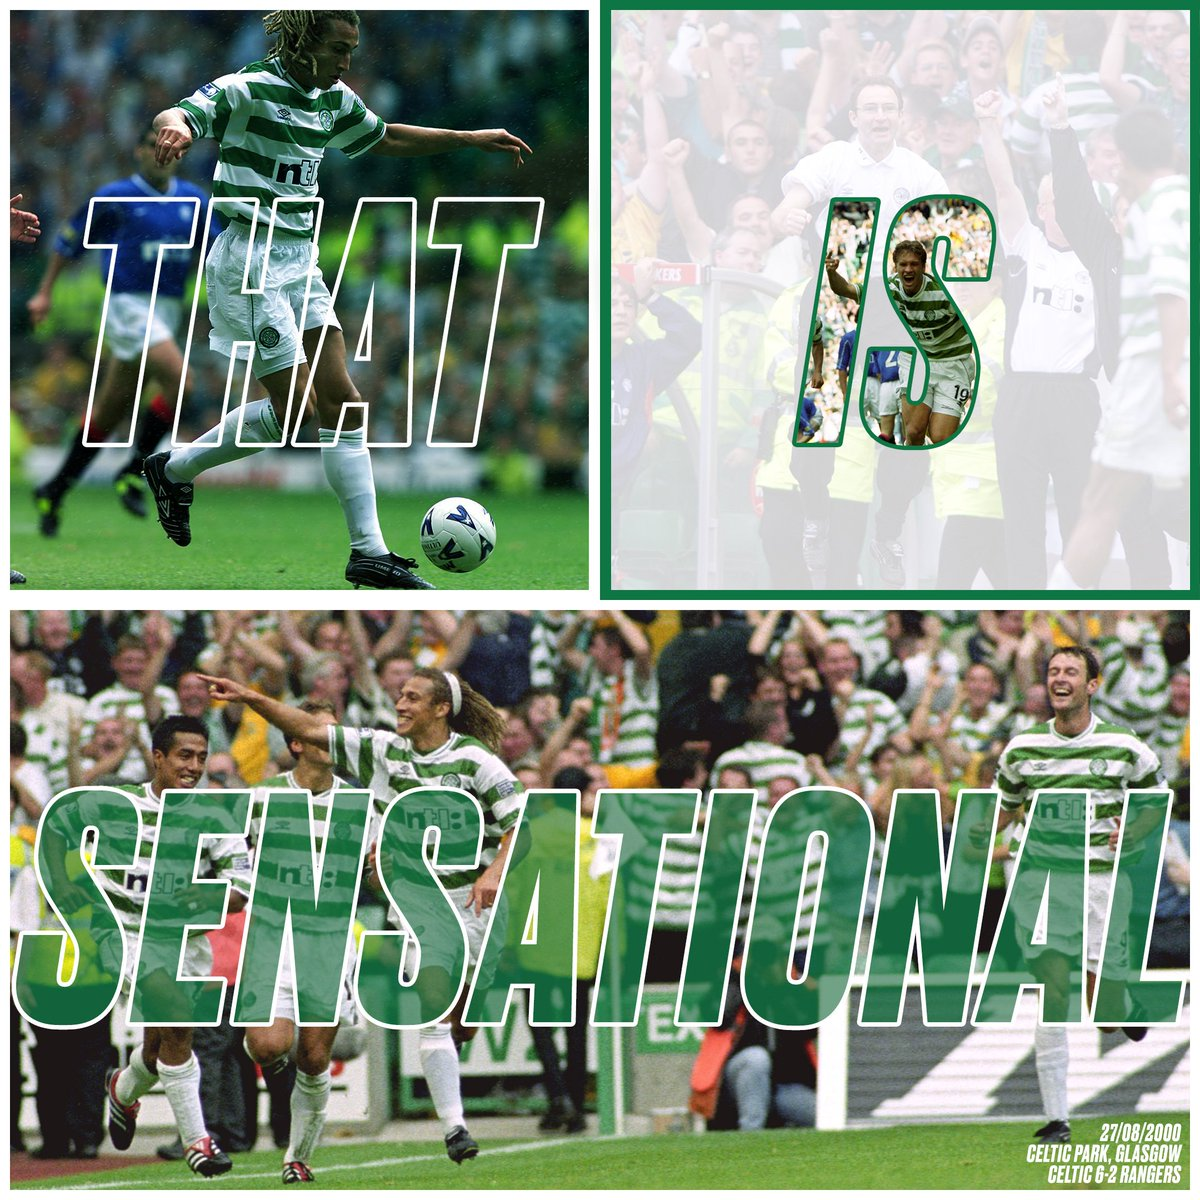 celtic football club celticfc